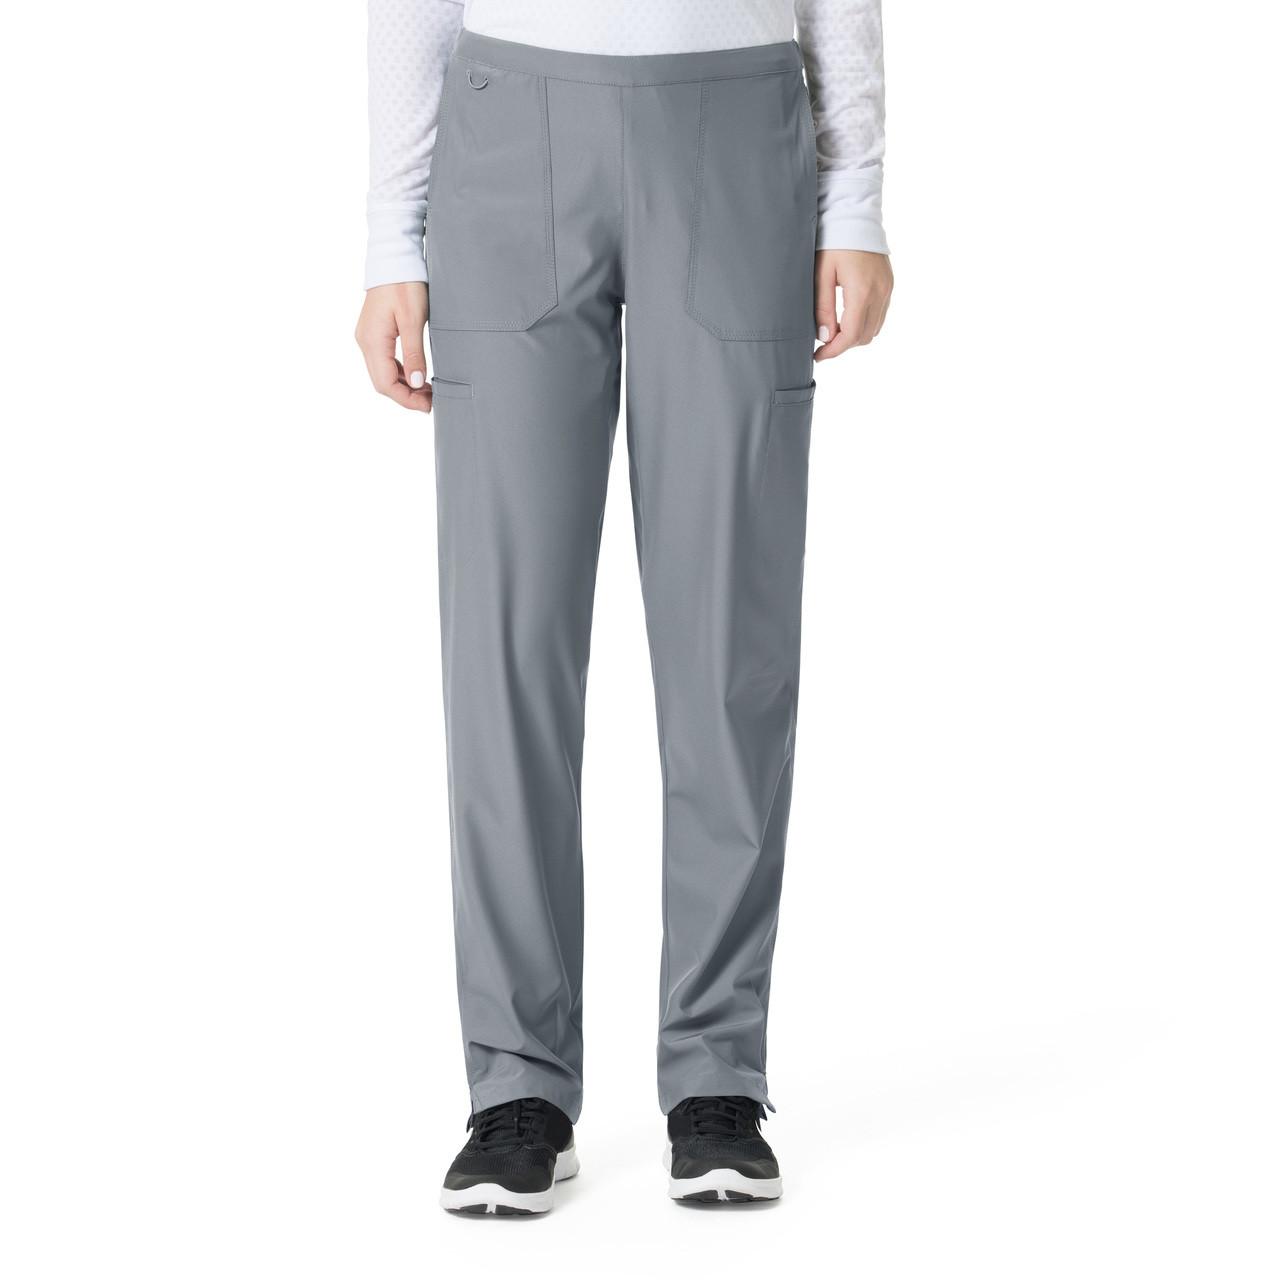 (C52106) Carhartt Liberty Flat Front Straight Leg Scrub Pant